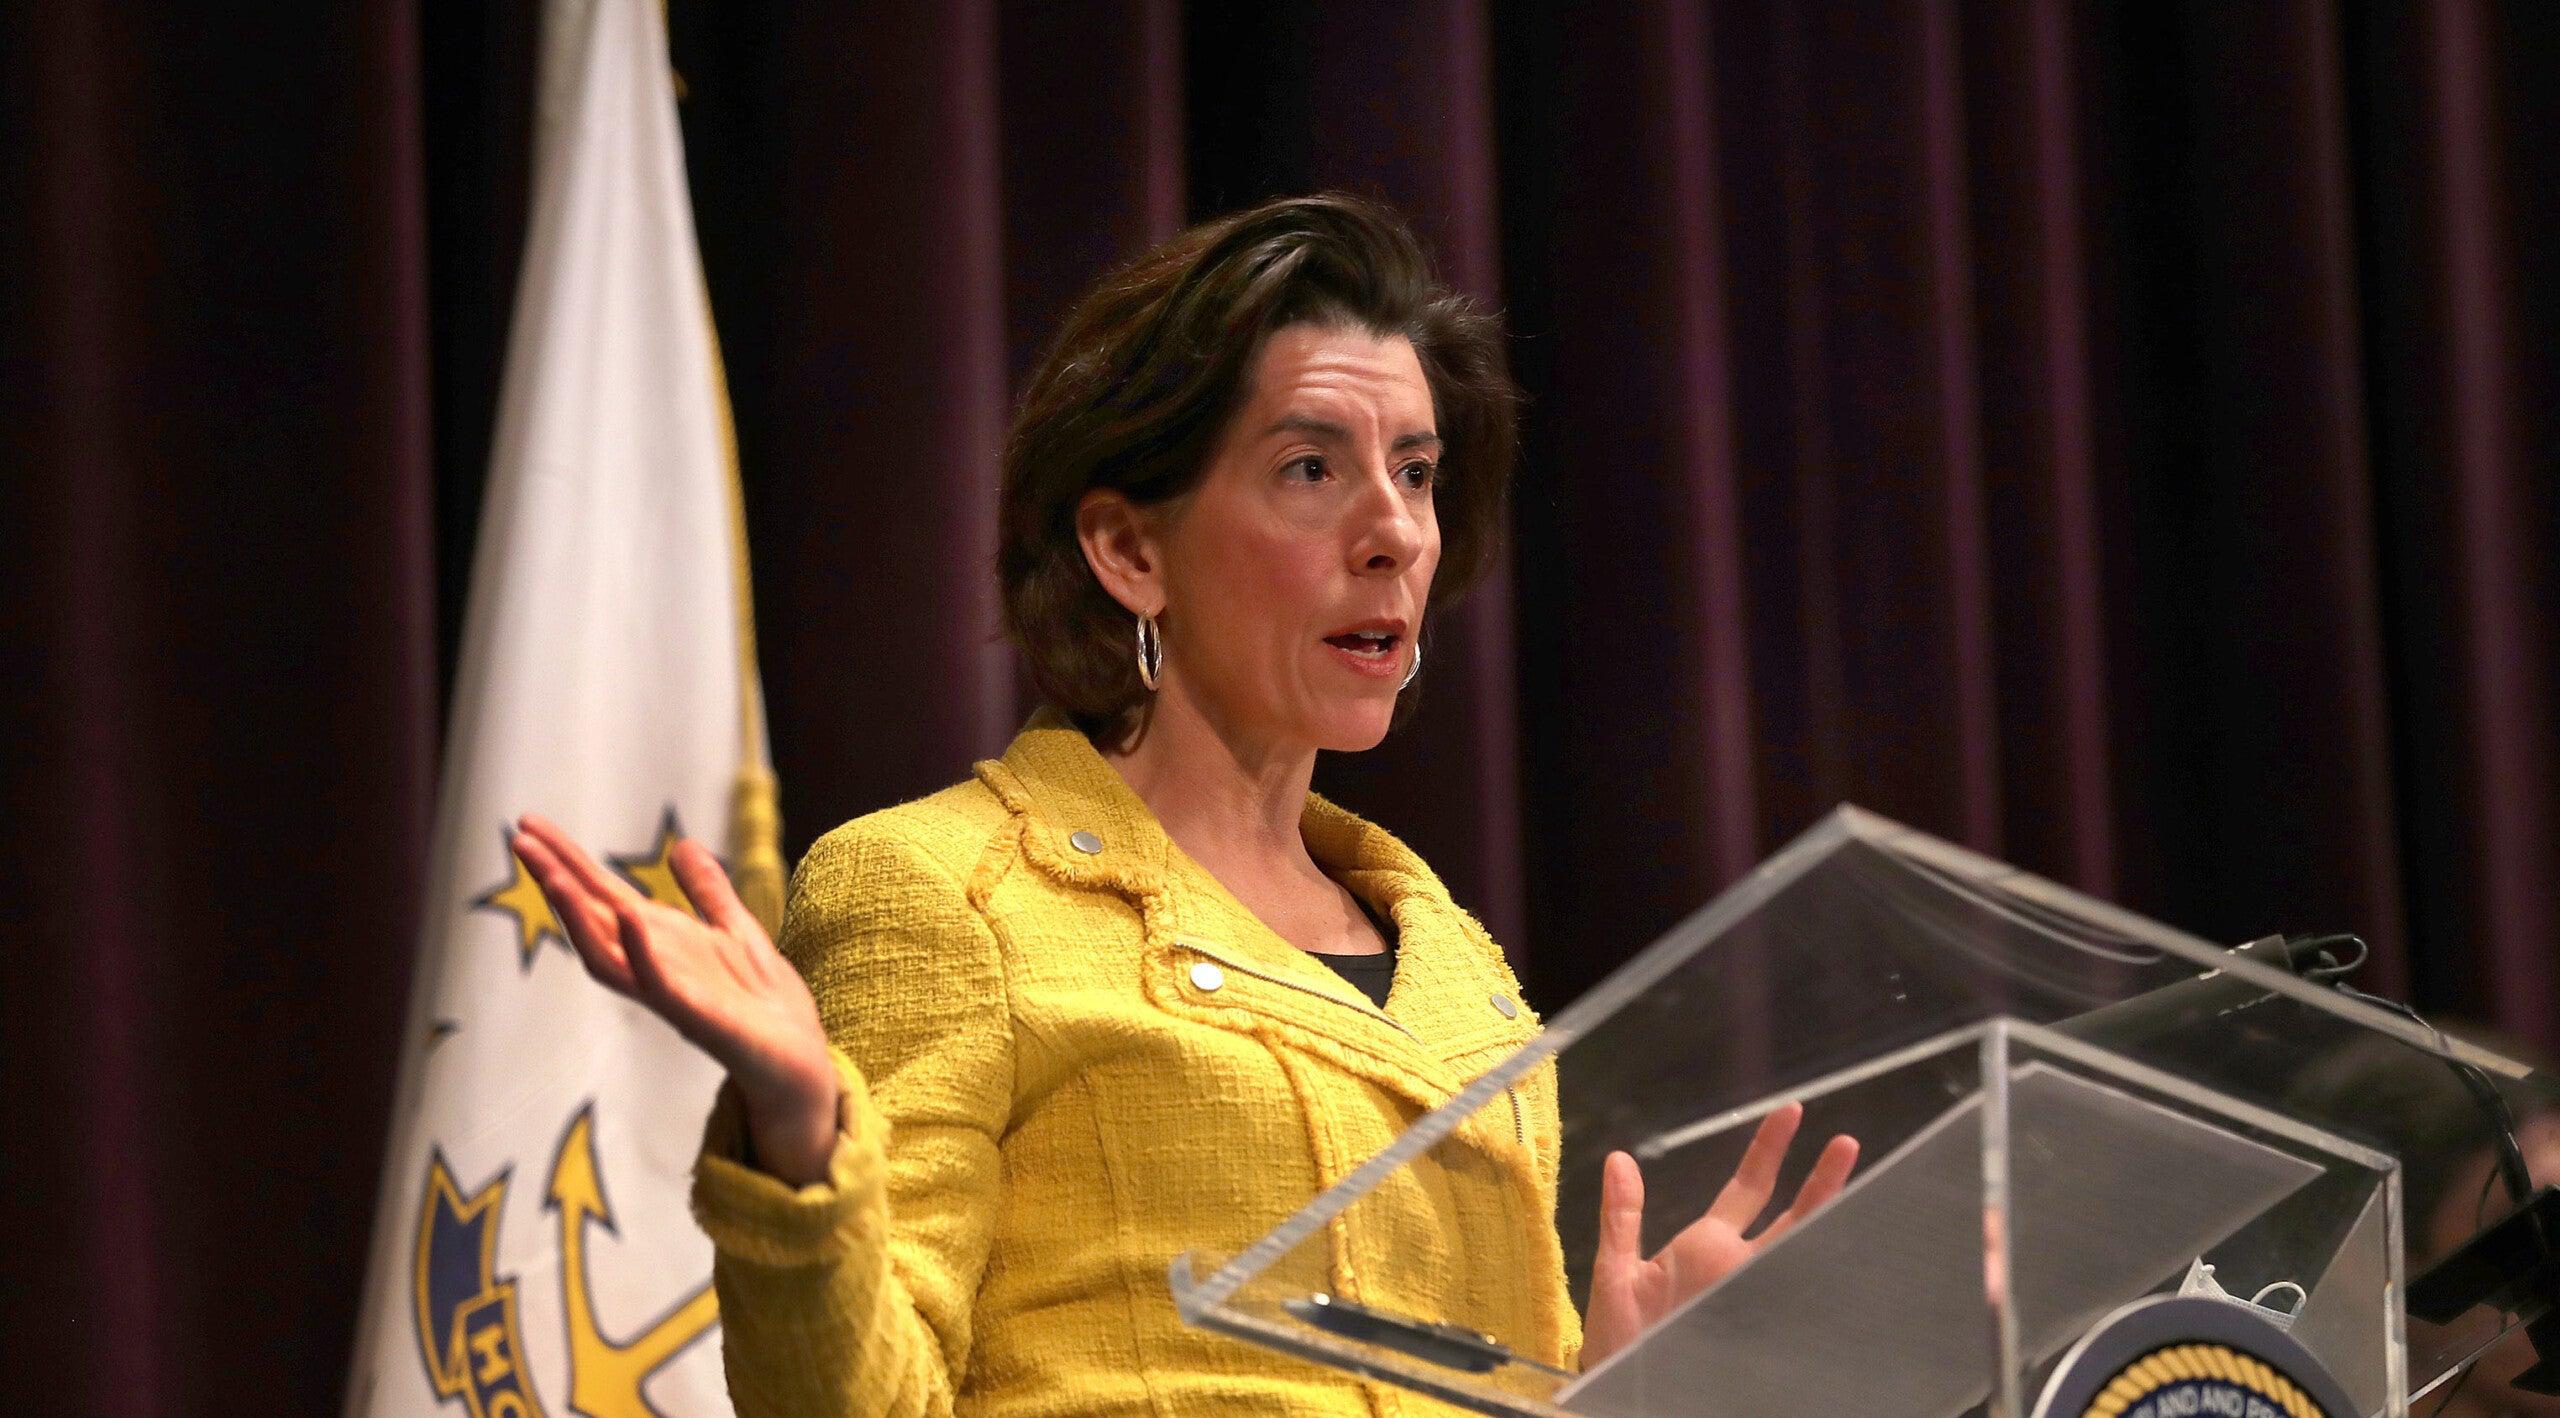 Biden to nominate Rhode Island Governor Gina Raimondo to